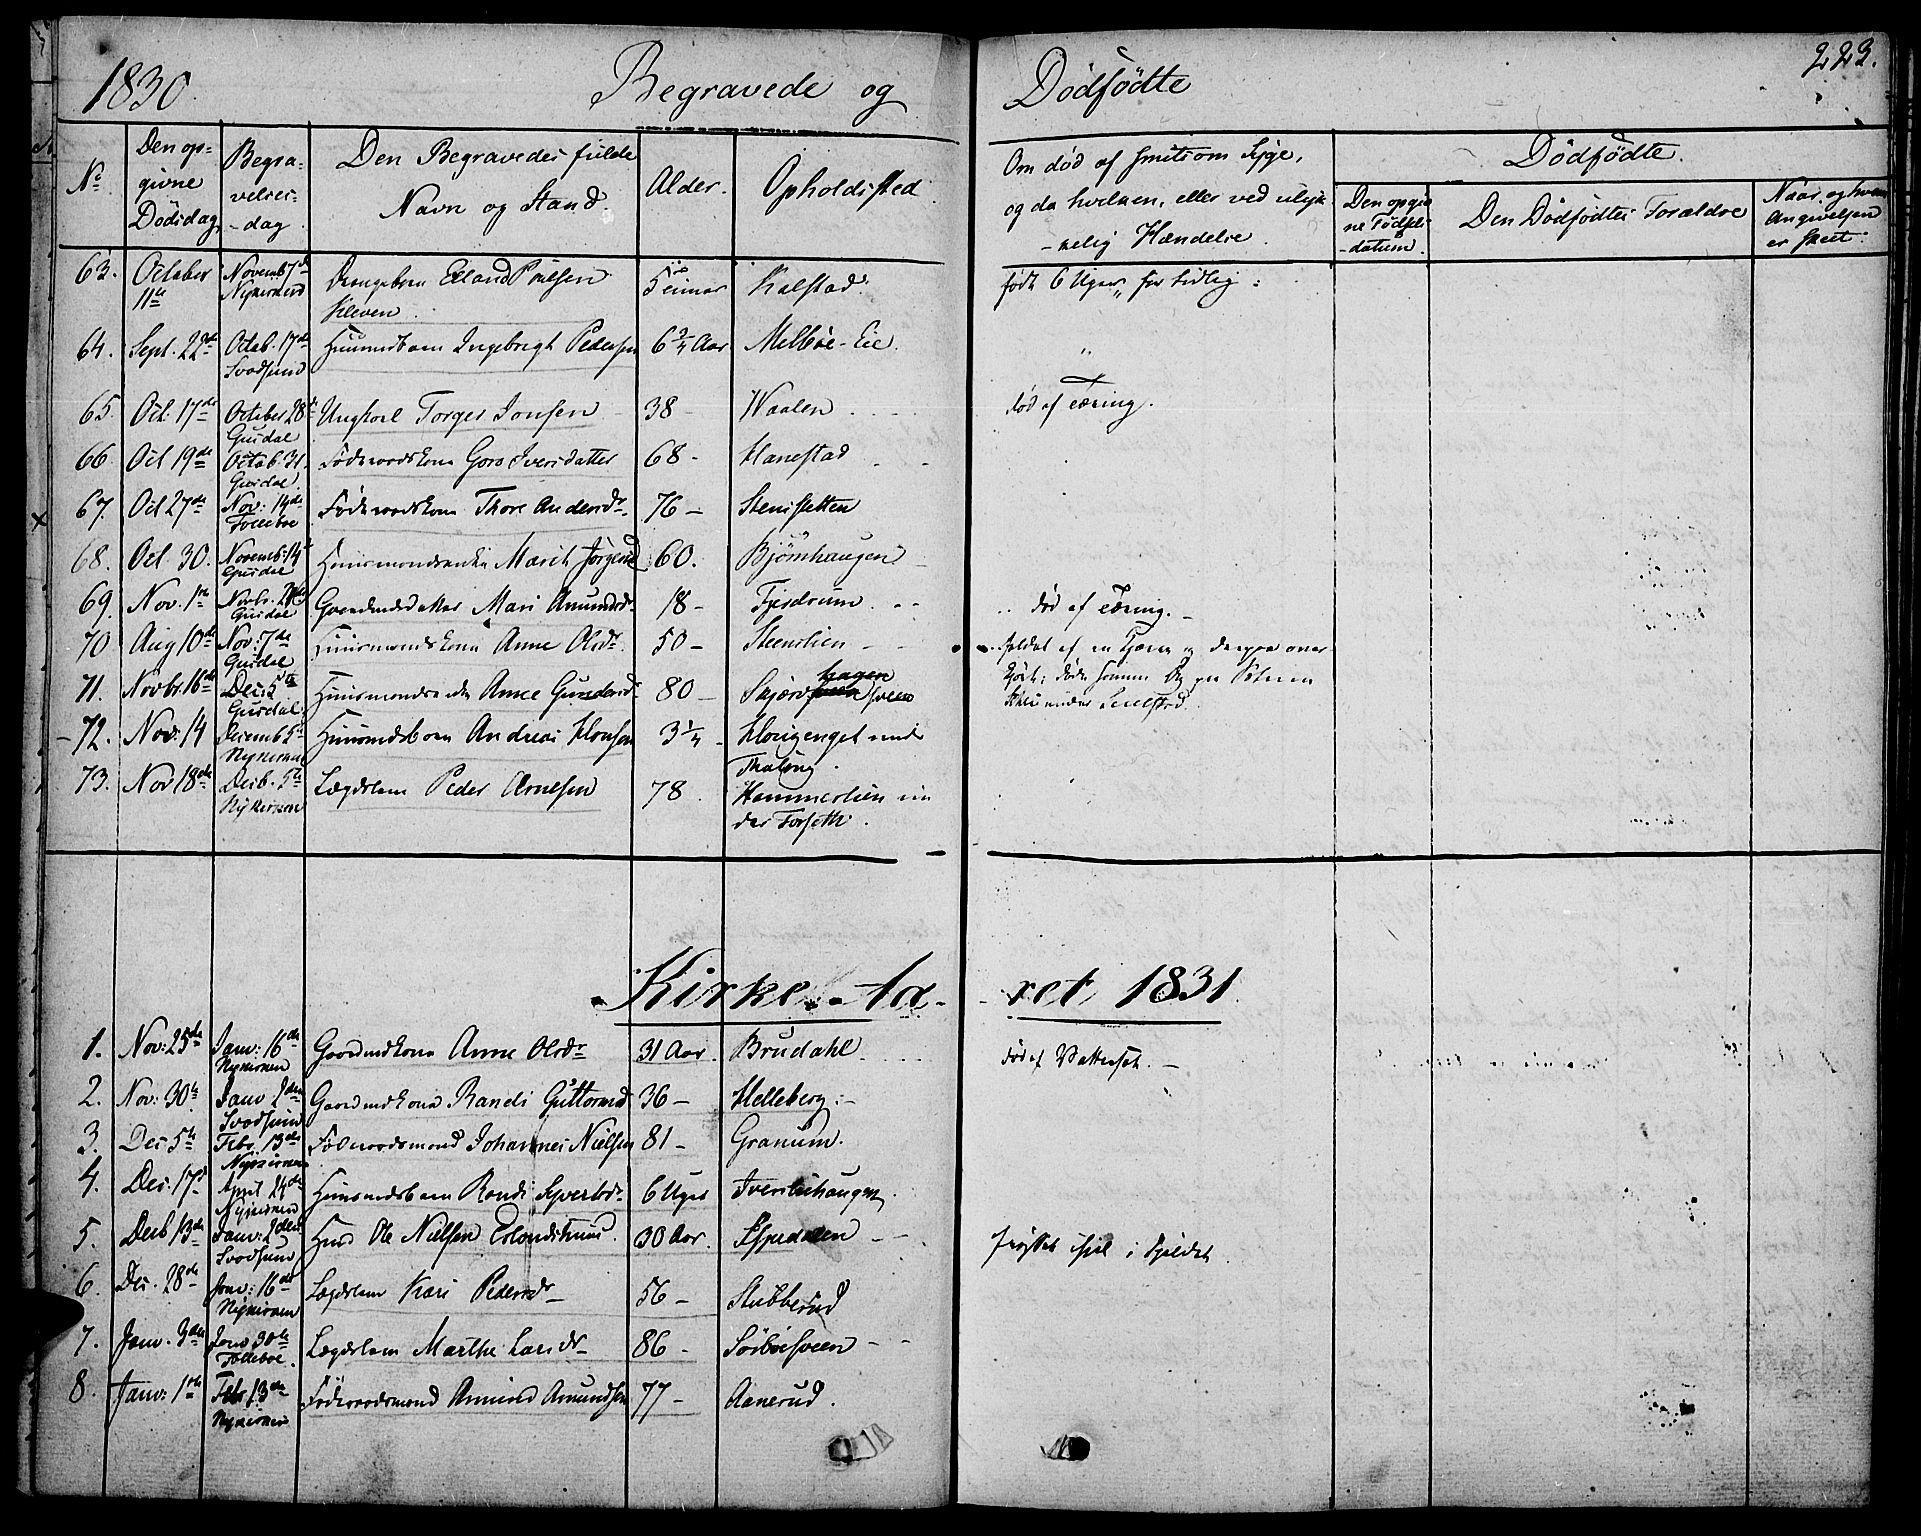 SAH, Gausdal prestekontor, Ministerialbok nr. 6, 1830-1839, s. 223